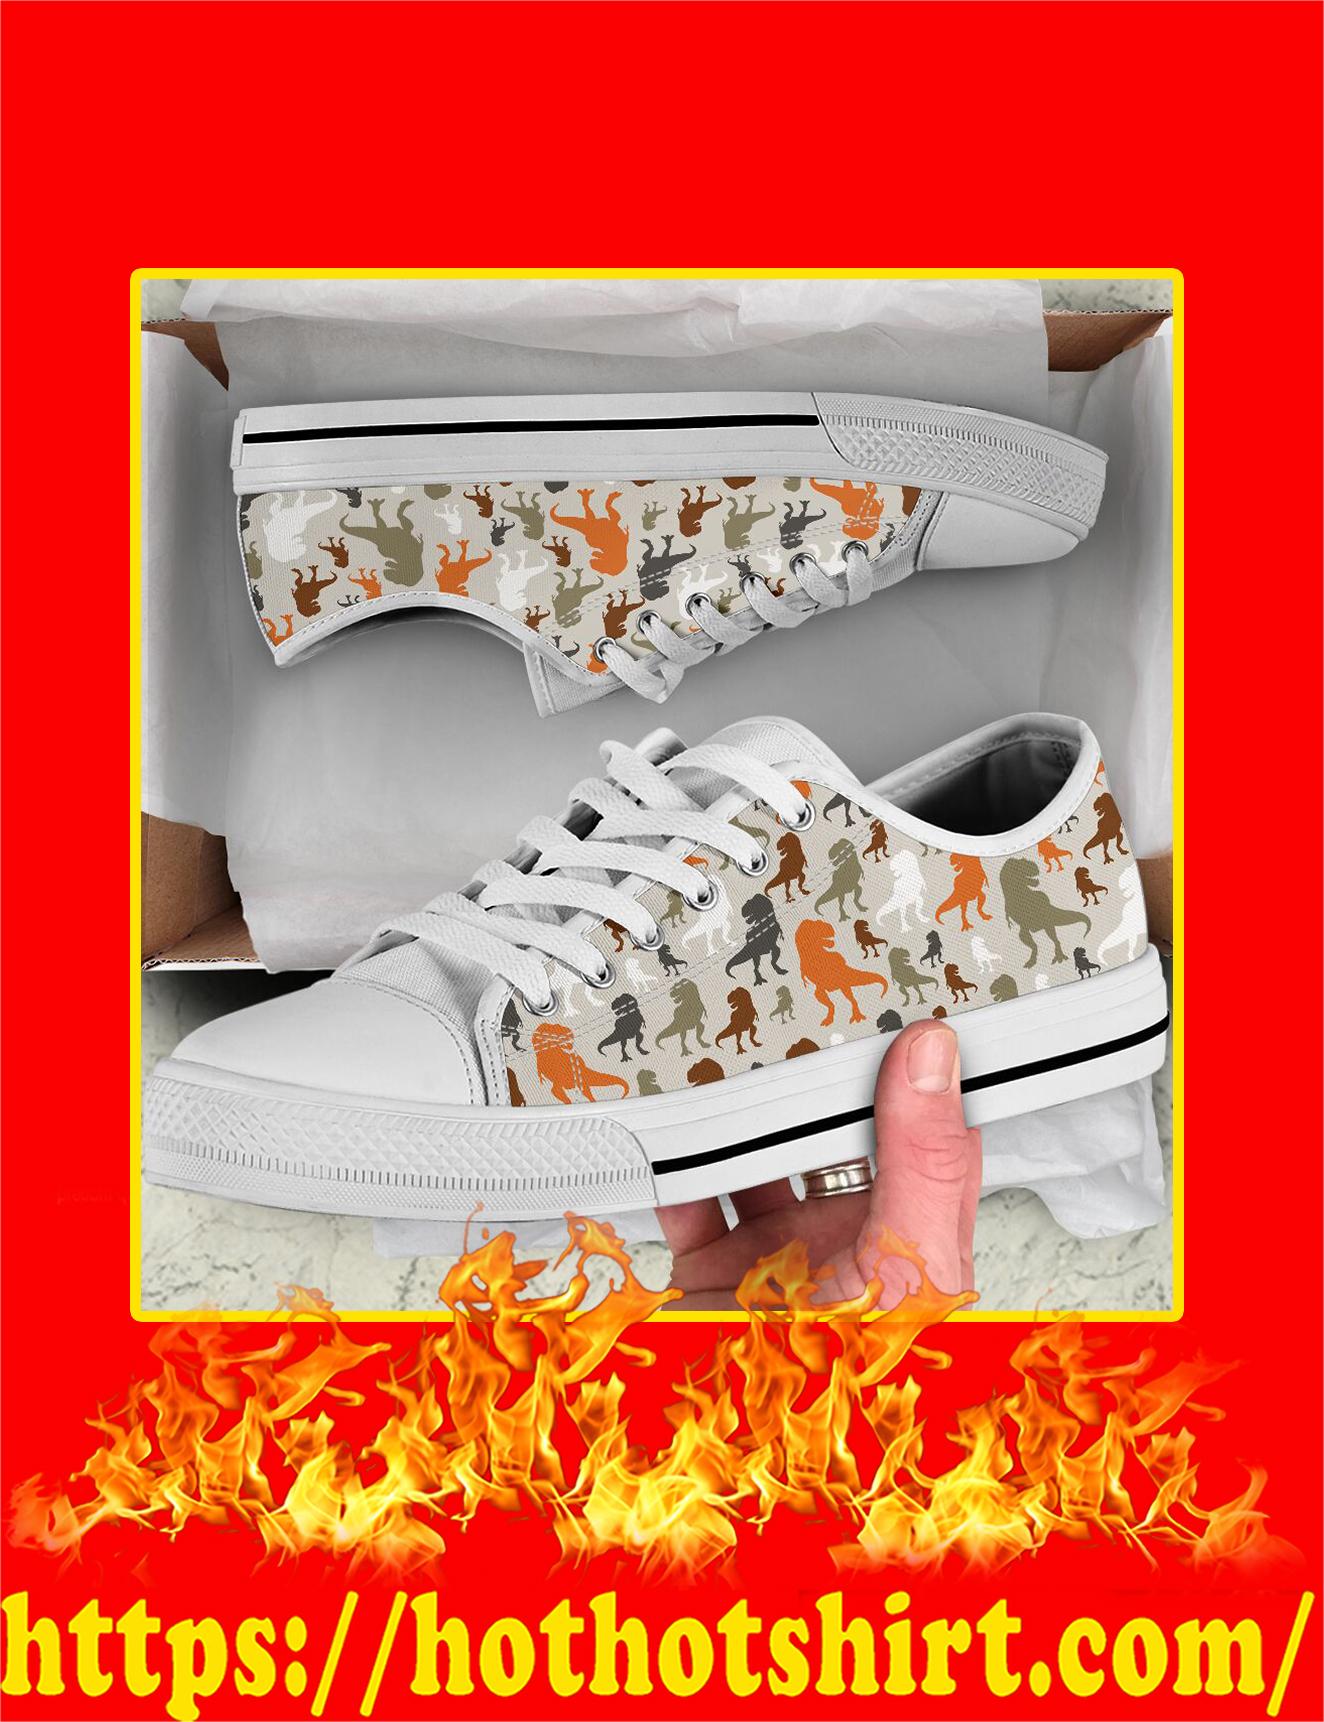 T Rex Low Top Shoes - Pic 3